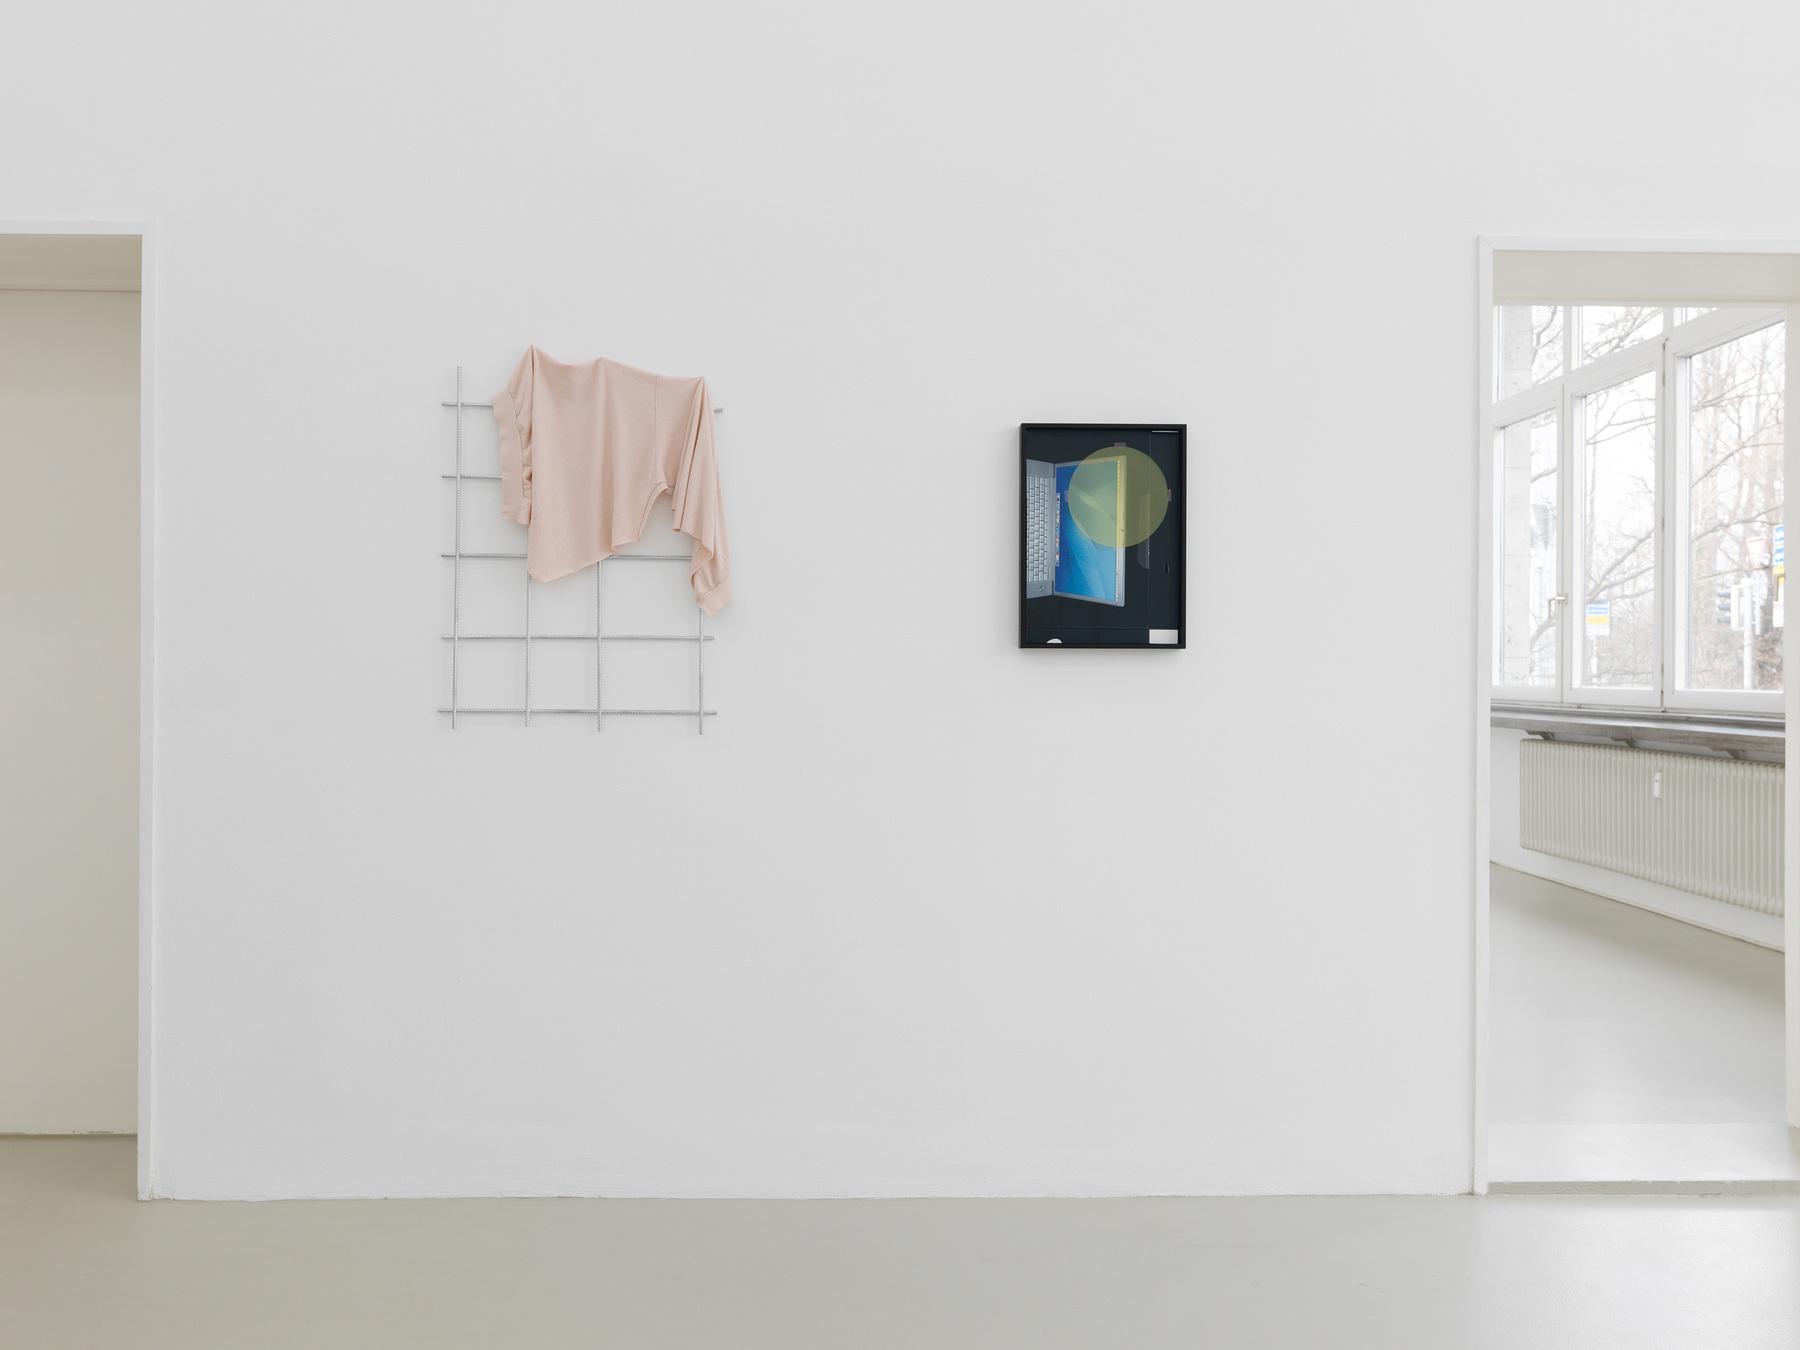 12_Edit Oderbolz_Kunstverein Nürnberg_2017